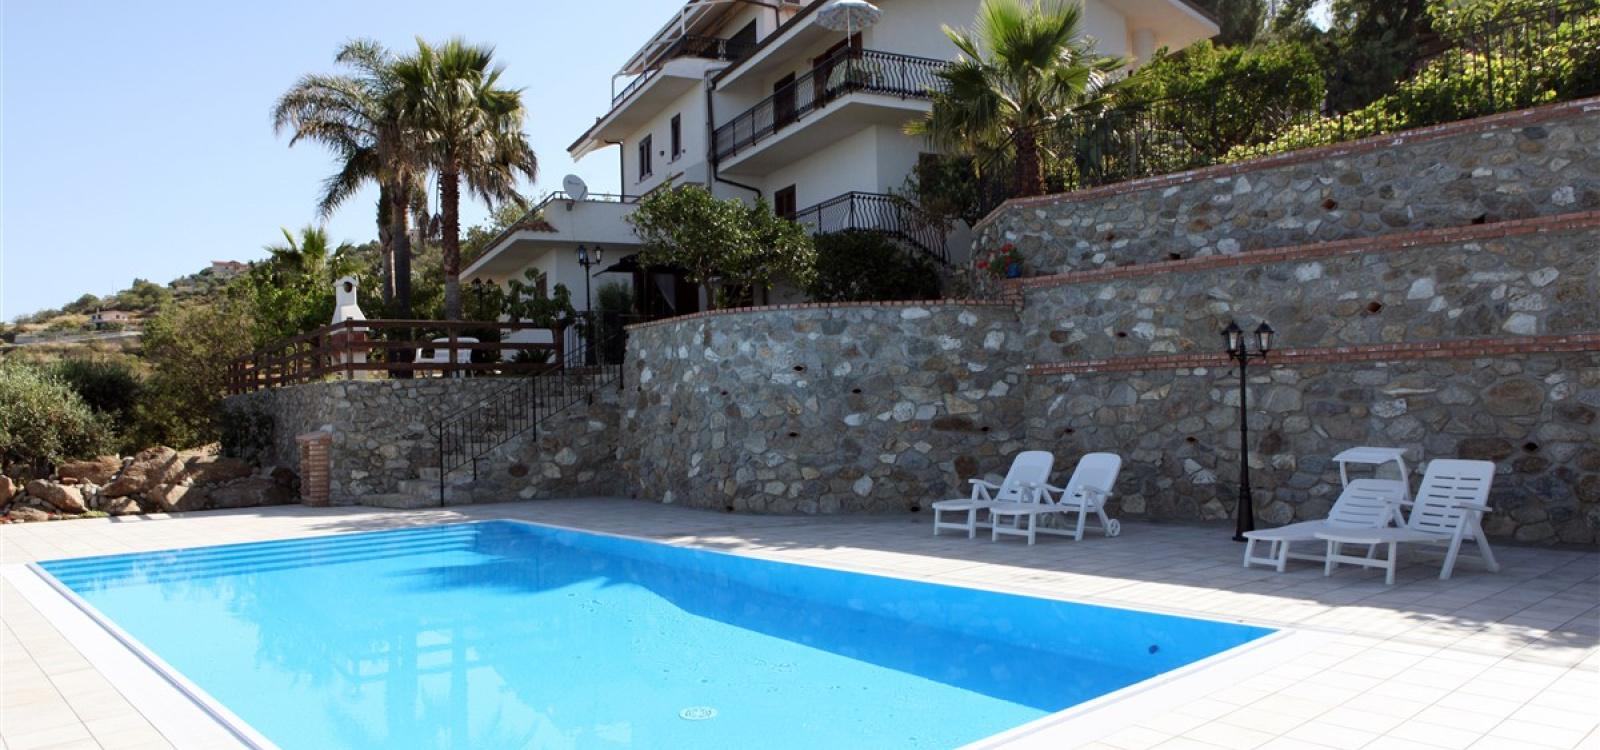 Villa con piscina in Calabria